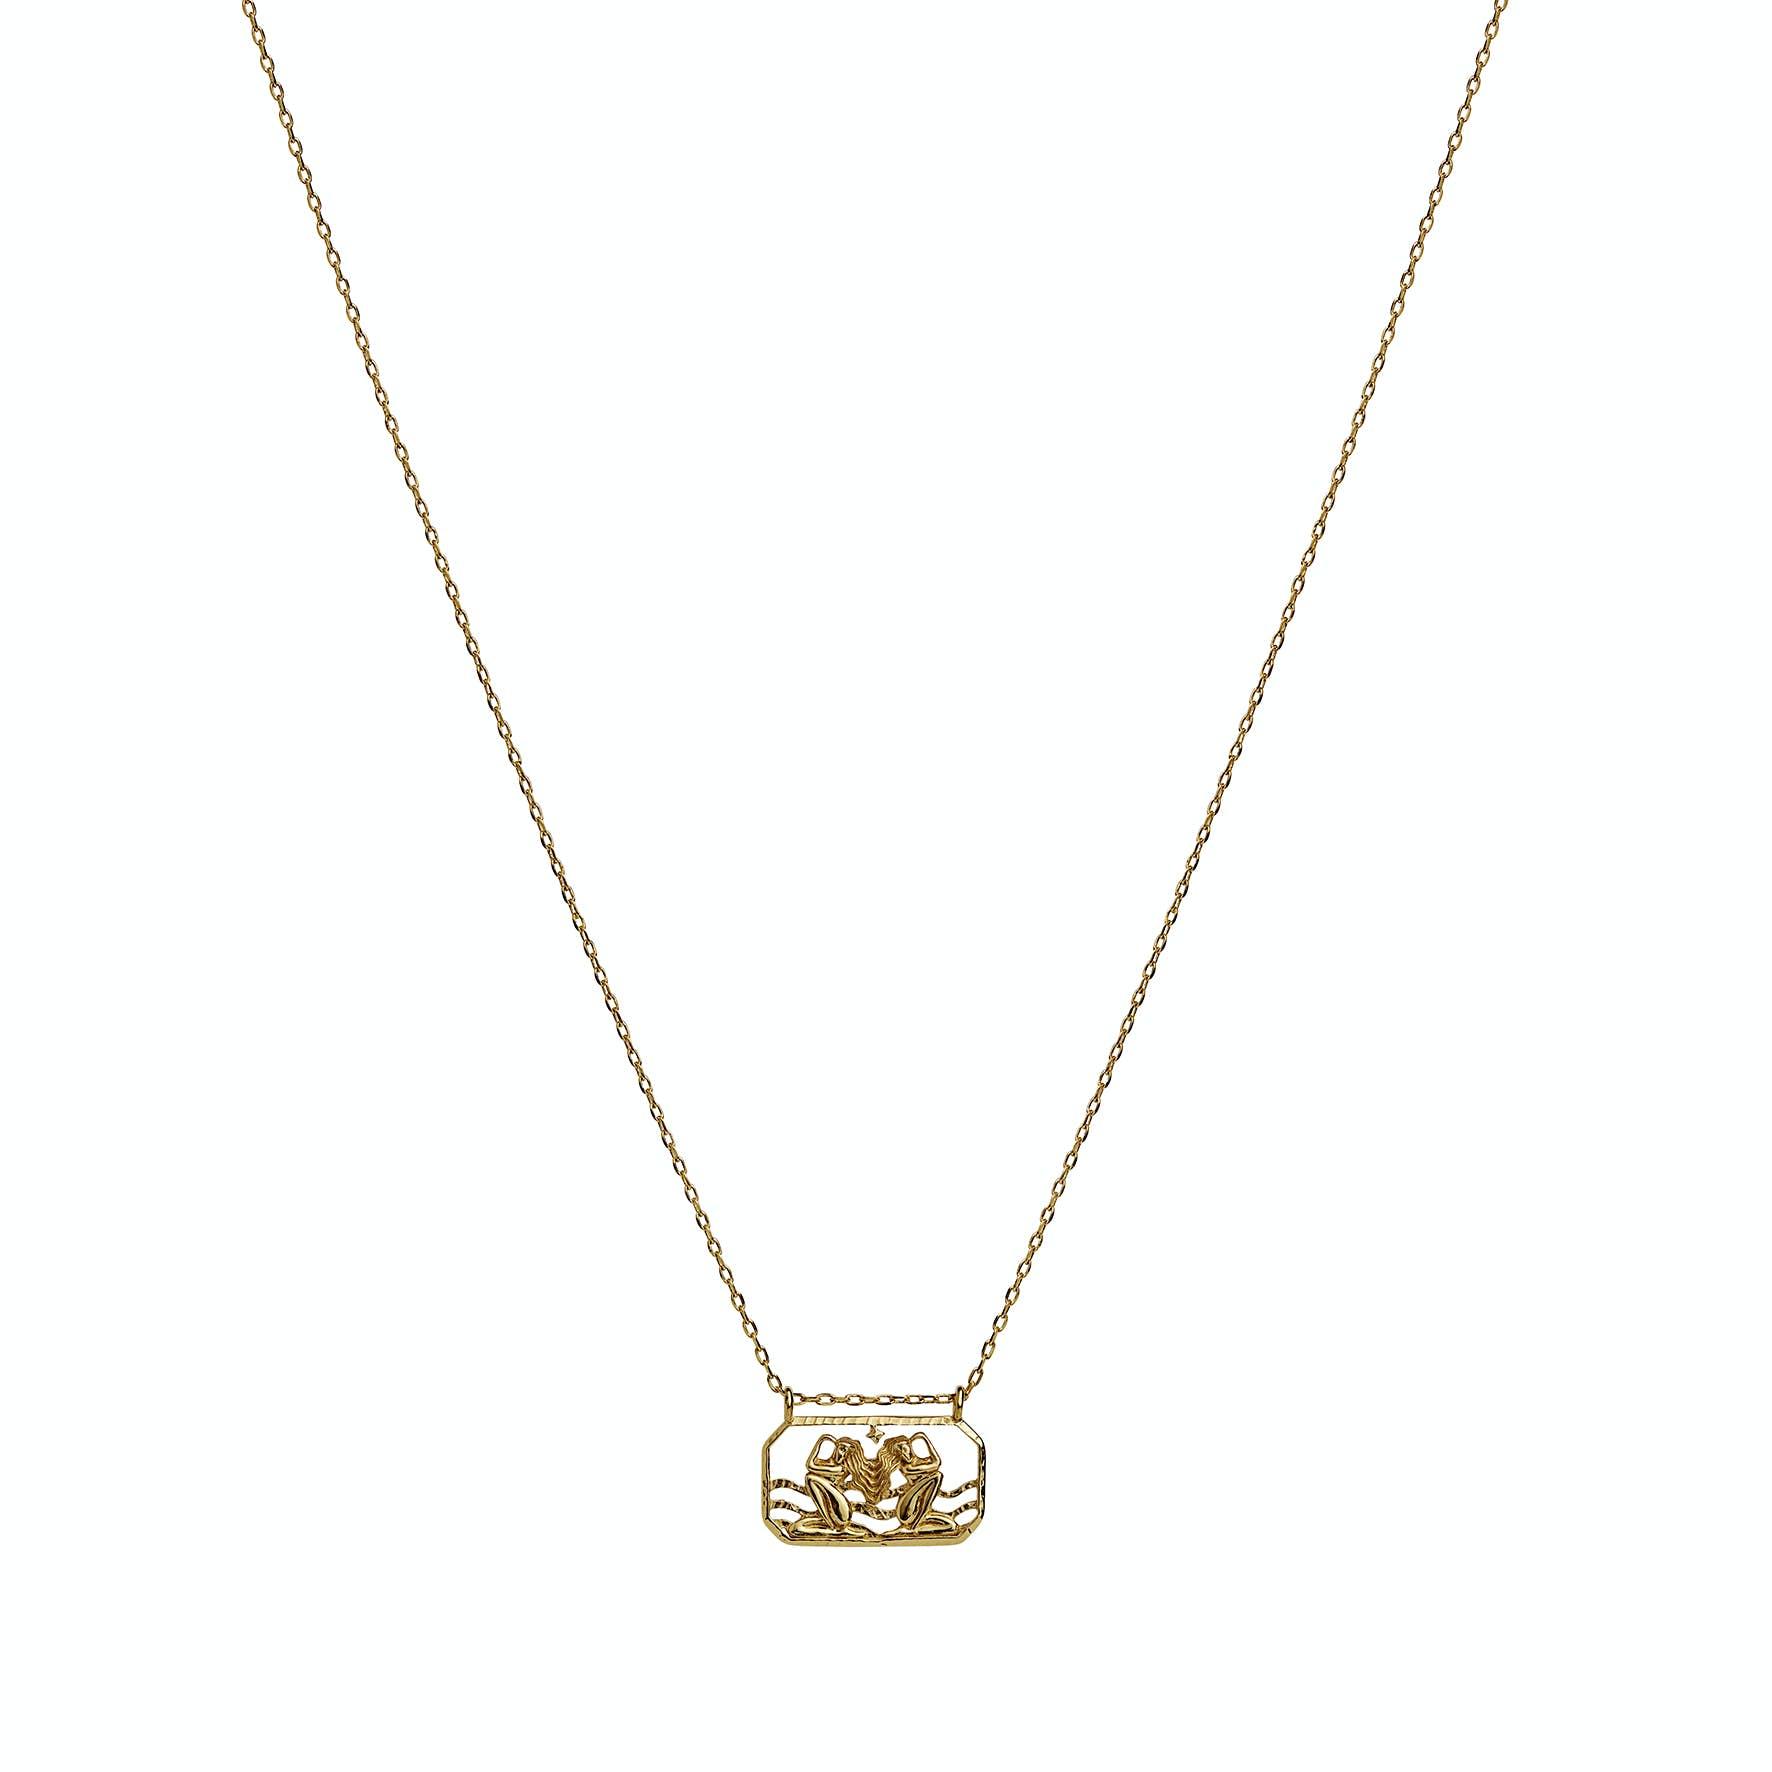 Zodiac Gemini Necklace (May 22 - June 21) von Maanesten in Vergoldet-Silber Sterling 925